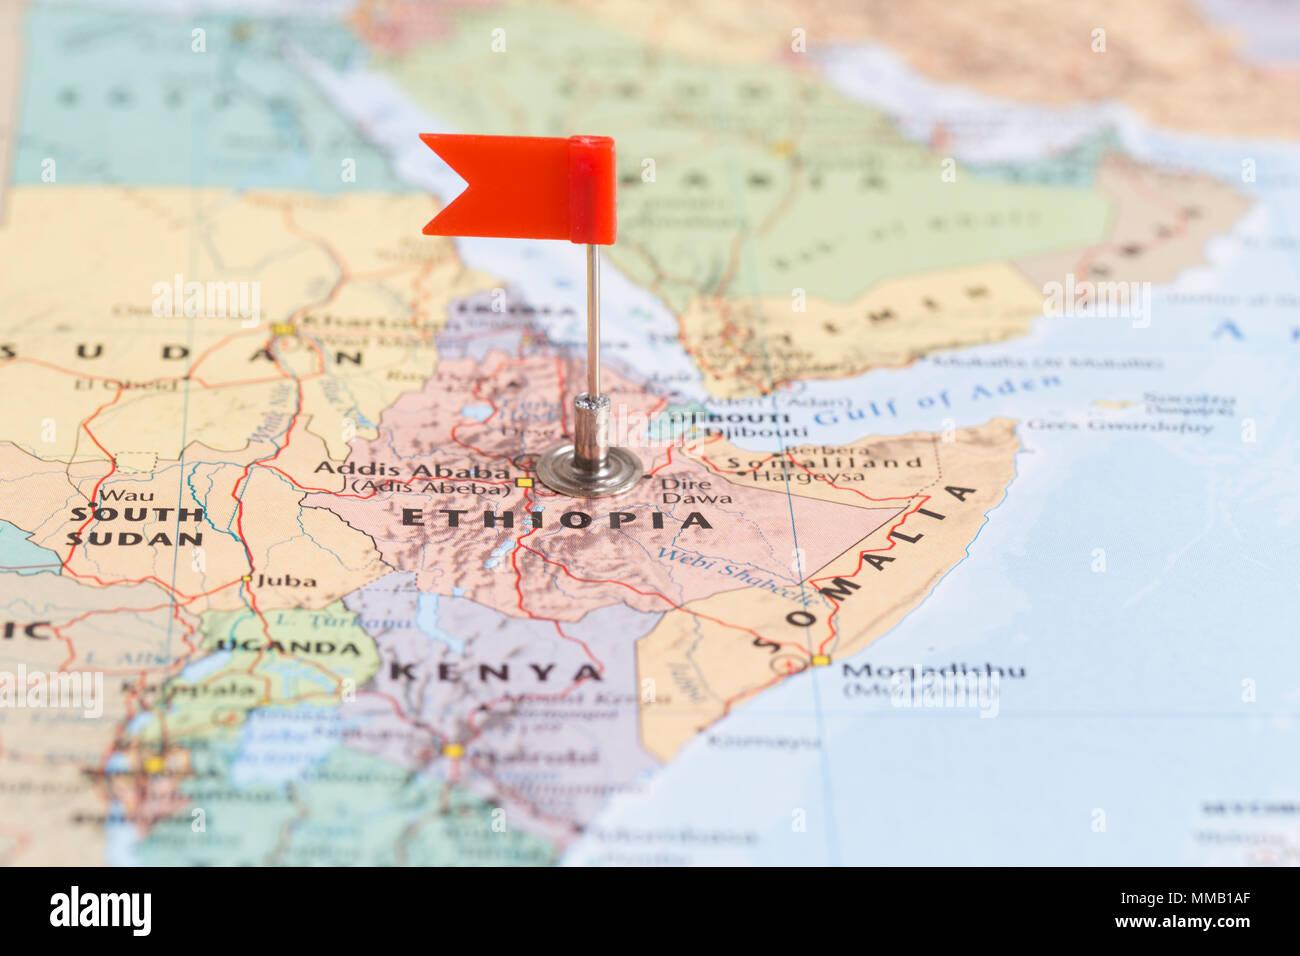 Ethiopia Map Stock Photos & Ethiopia Map Stock Images - Alamy